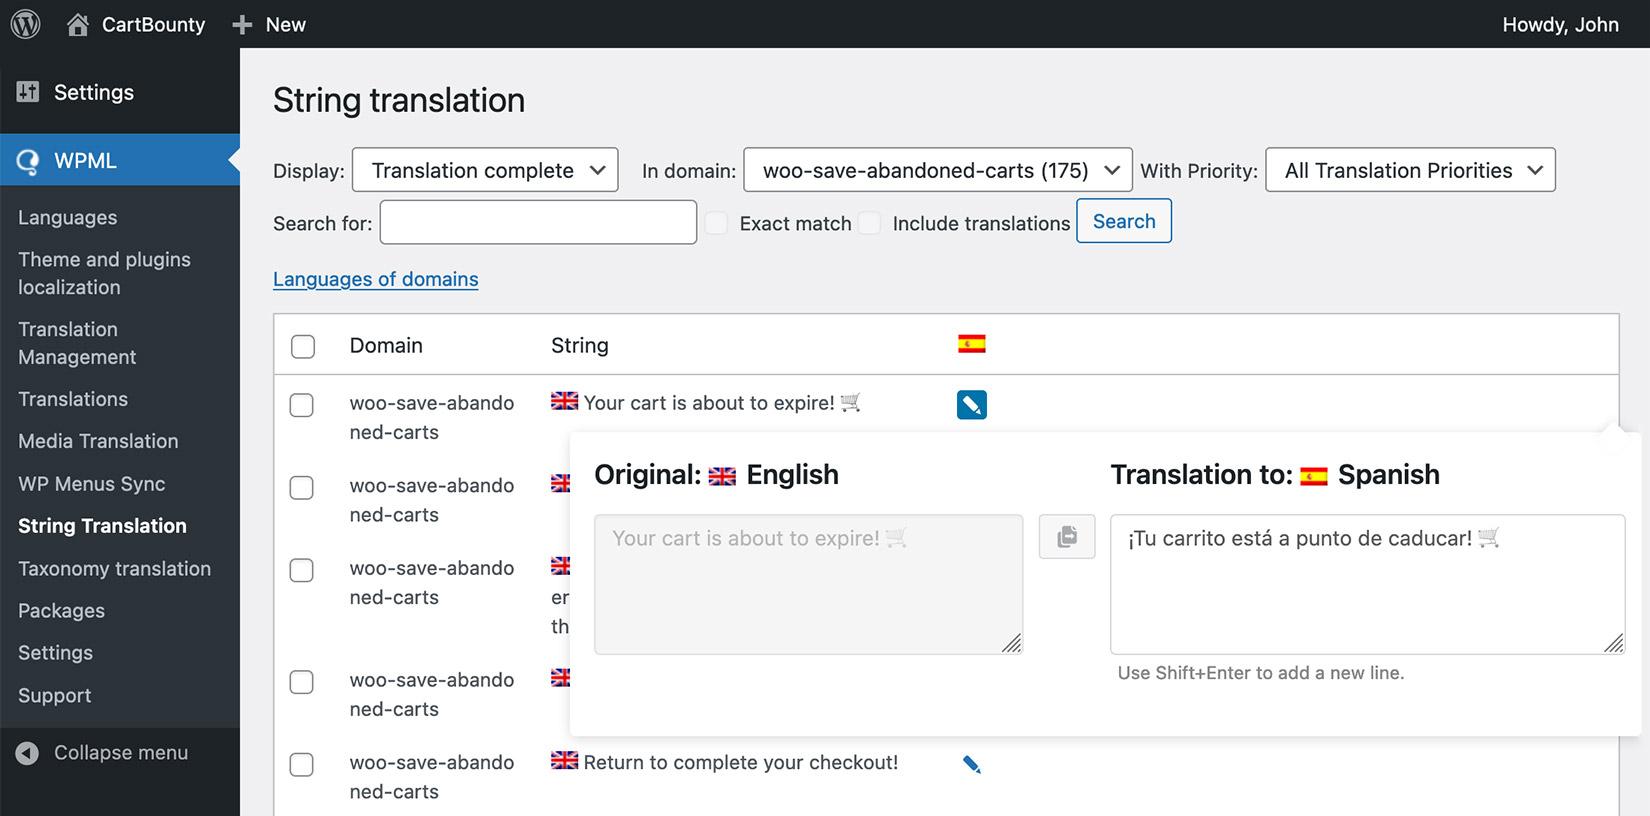 Translation management in WPML